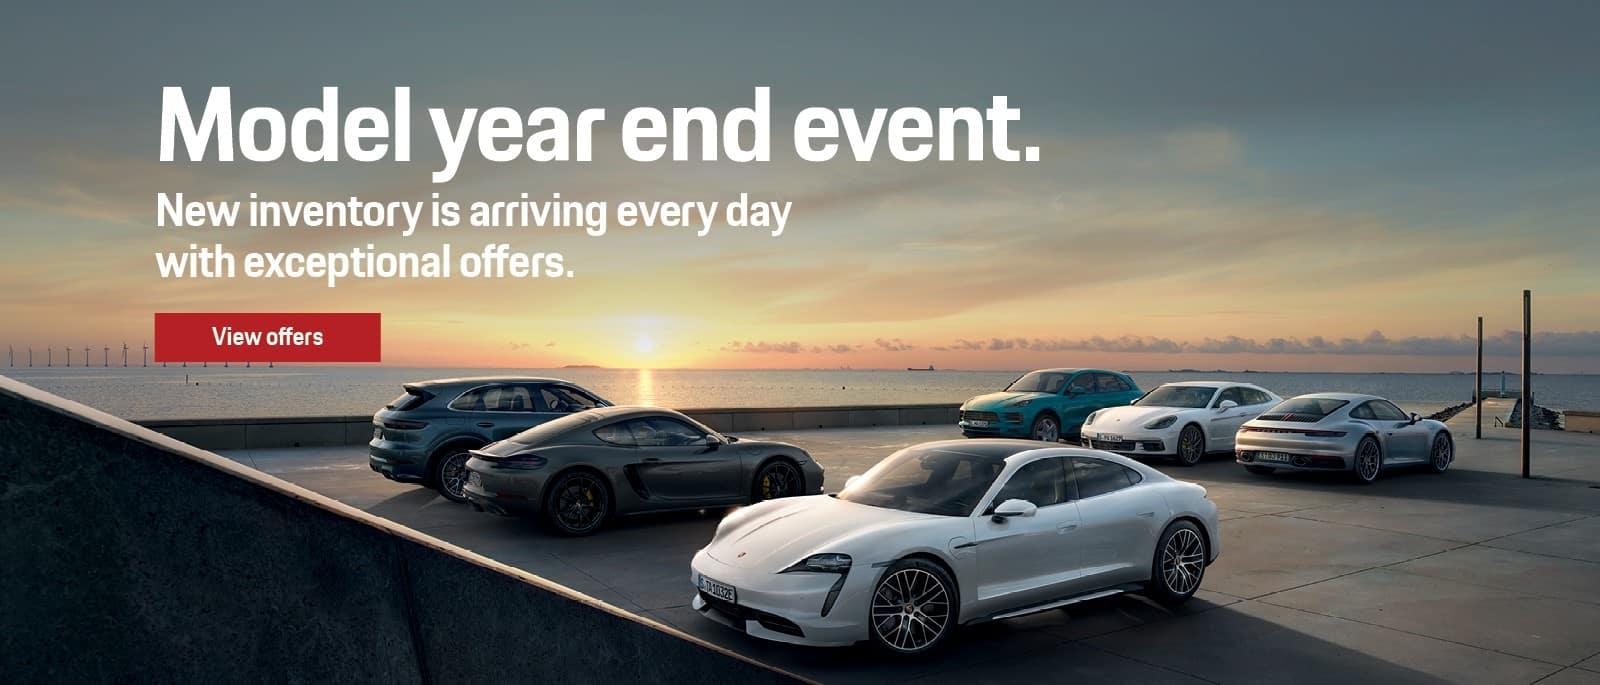 2021 Porsche Model Year End Sales Event